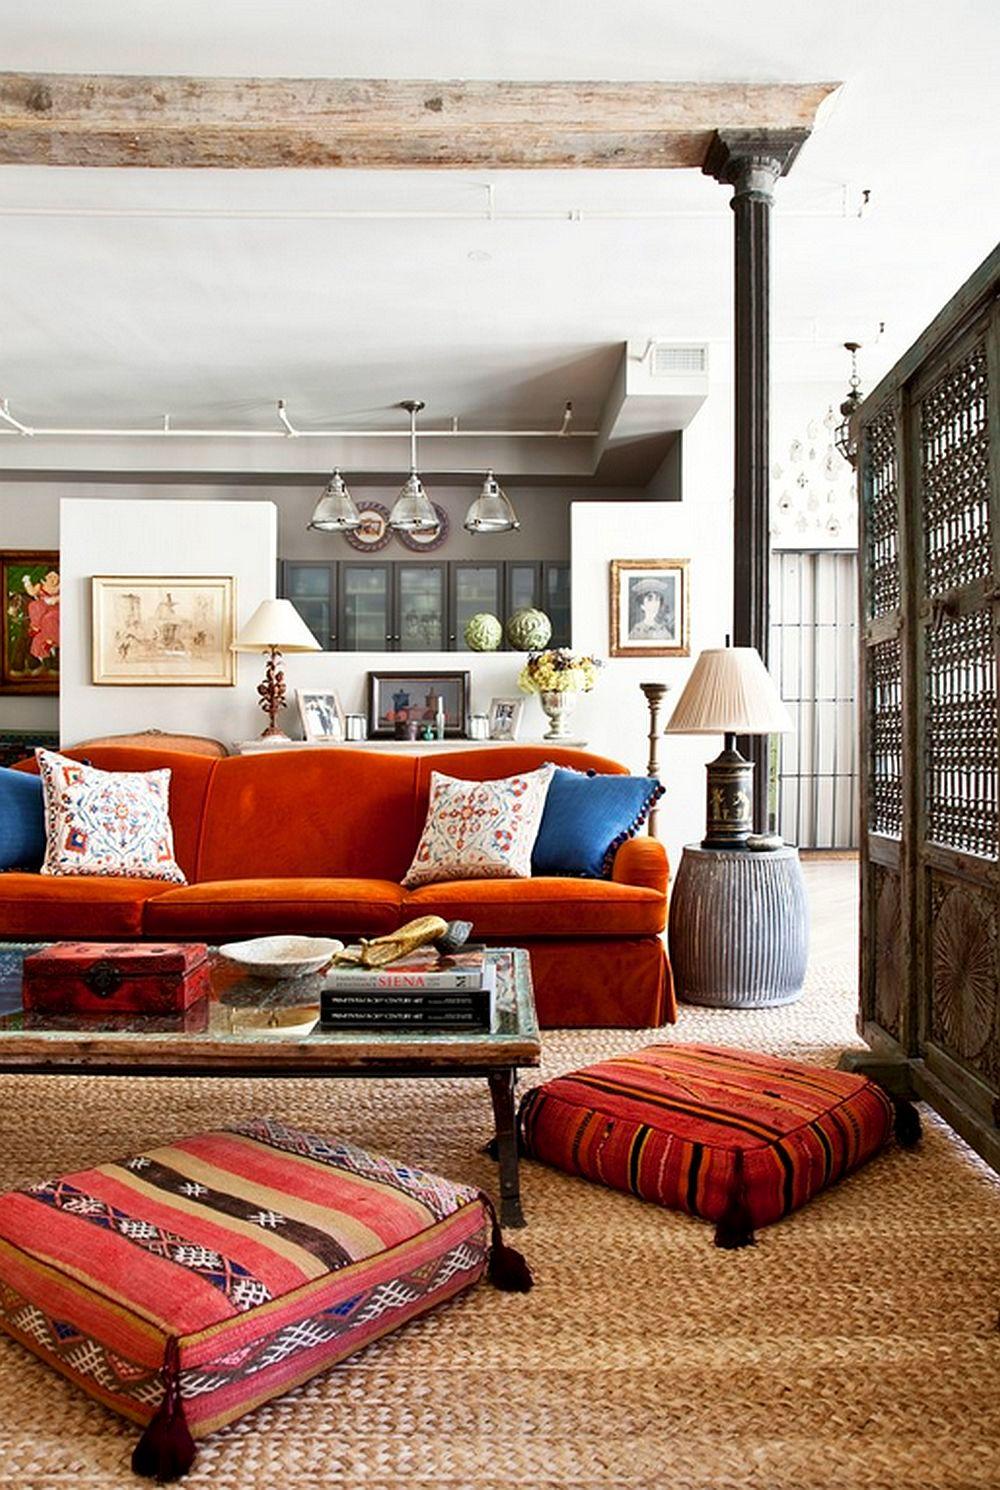 adelaparvu.com despre loft in stil eclectic cu influente marocane, morrocan style, designer Deborah French, Foto Yiorgos Kordakis (4)